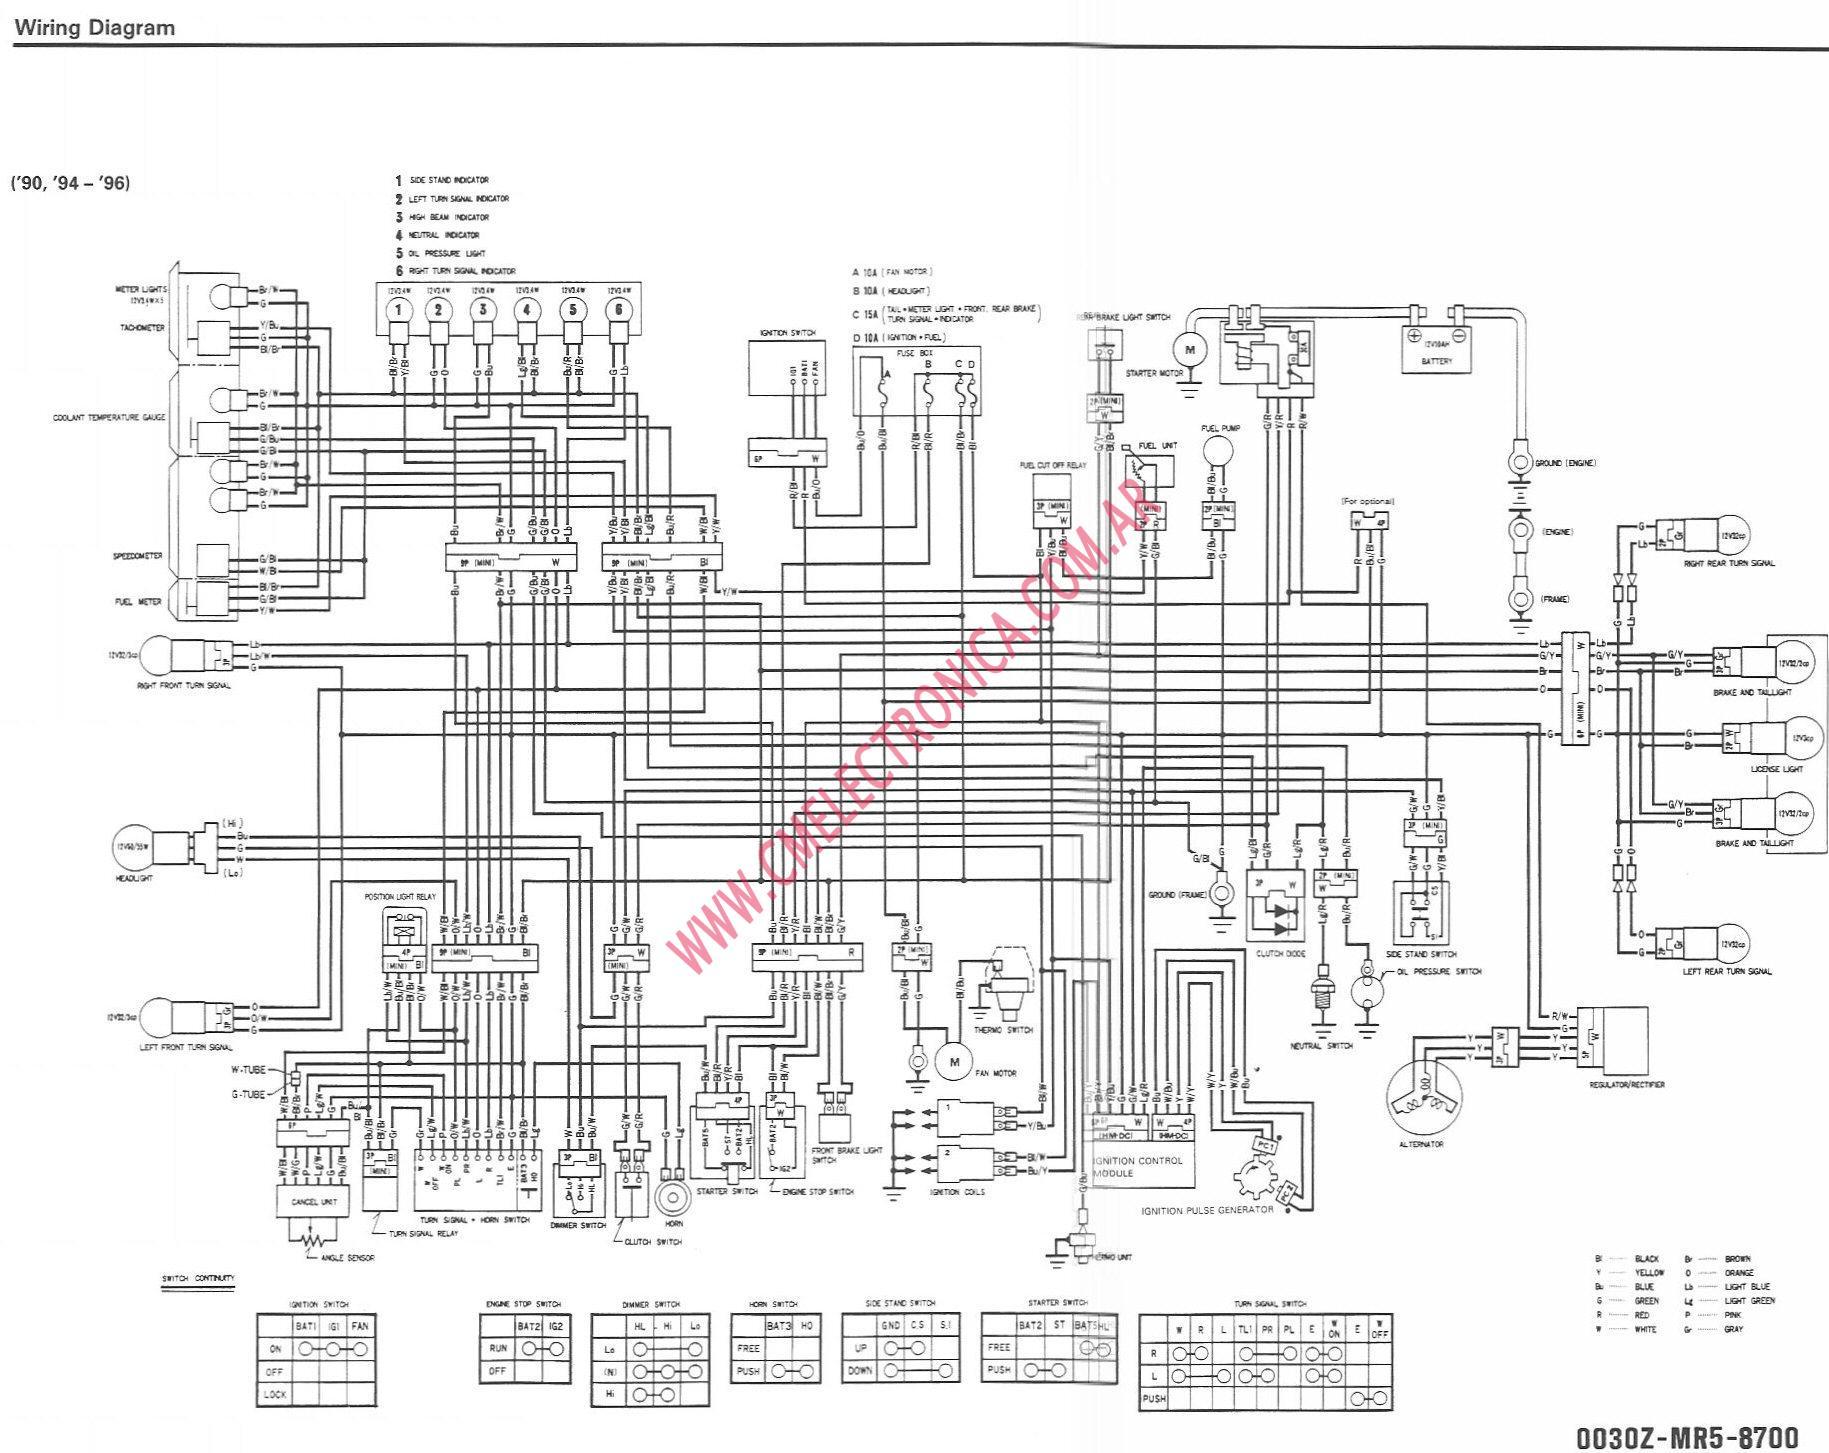 2006 Polaris Sportsman Fuse Box Location Electrical Wiring Diagrams 500